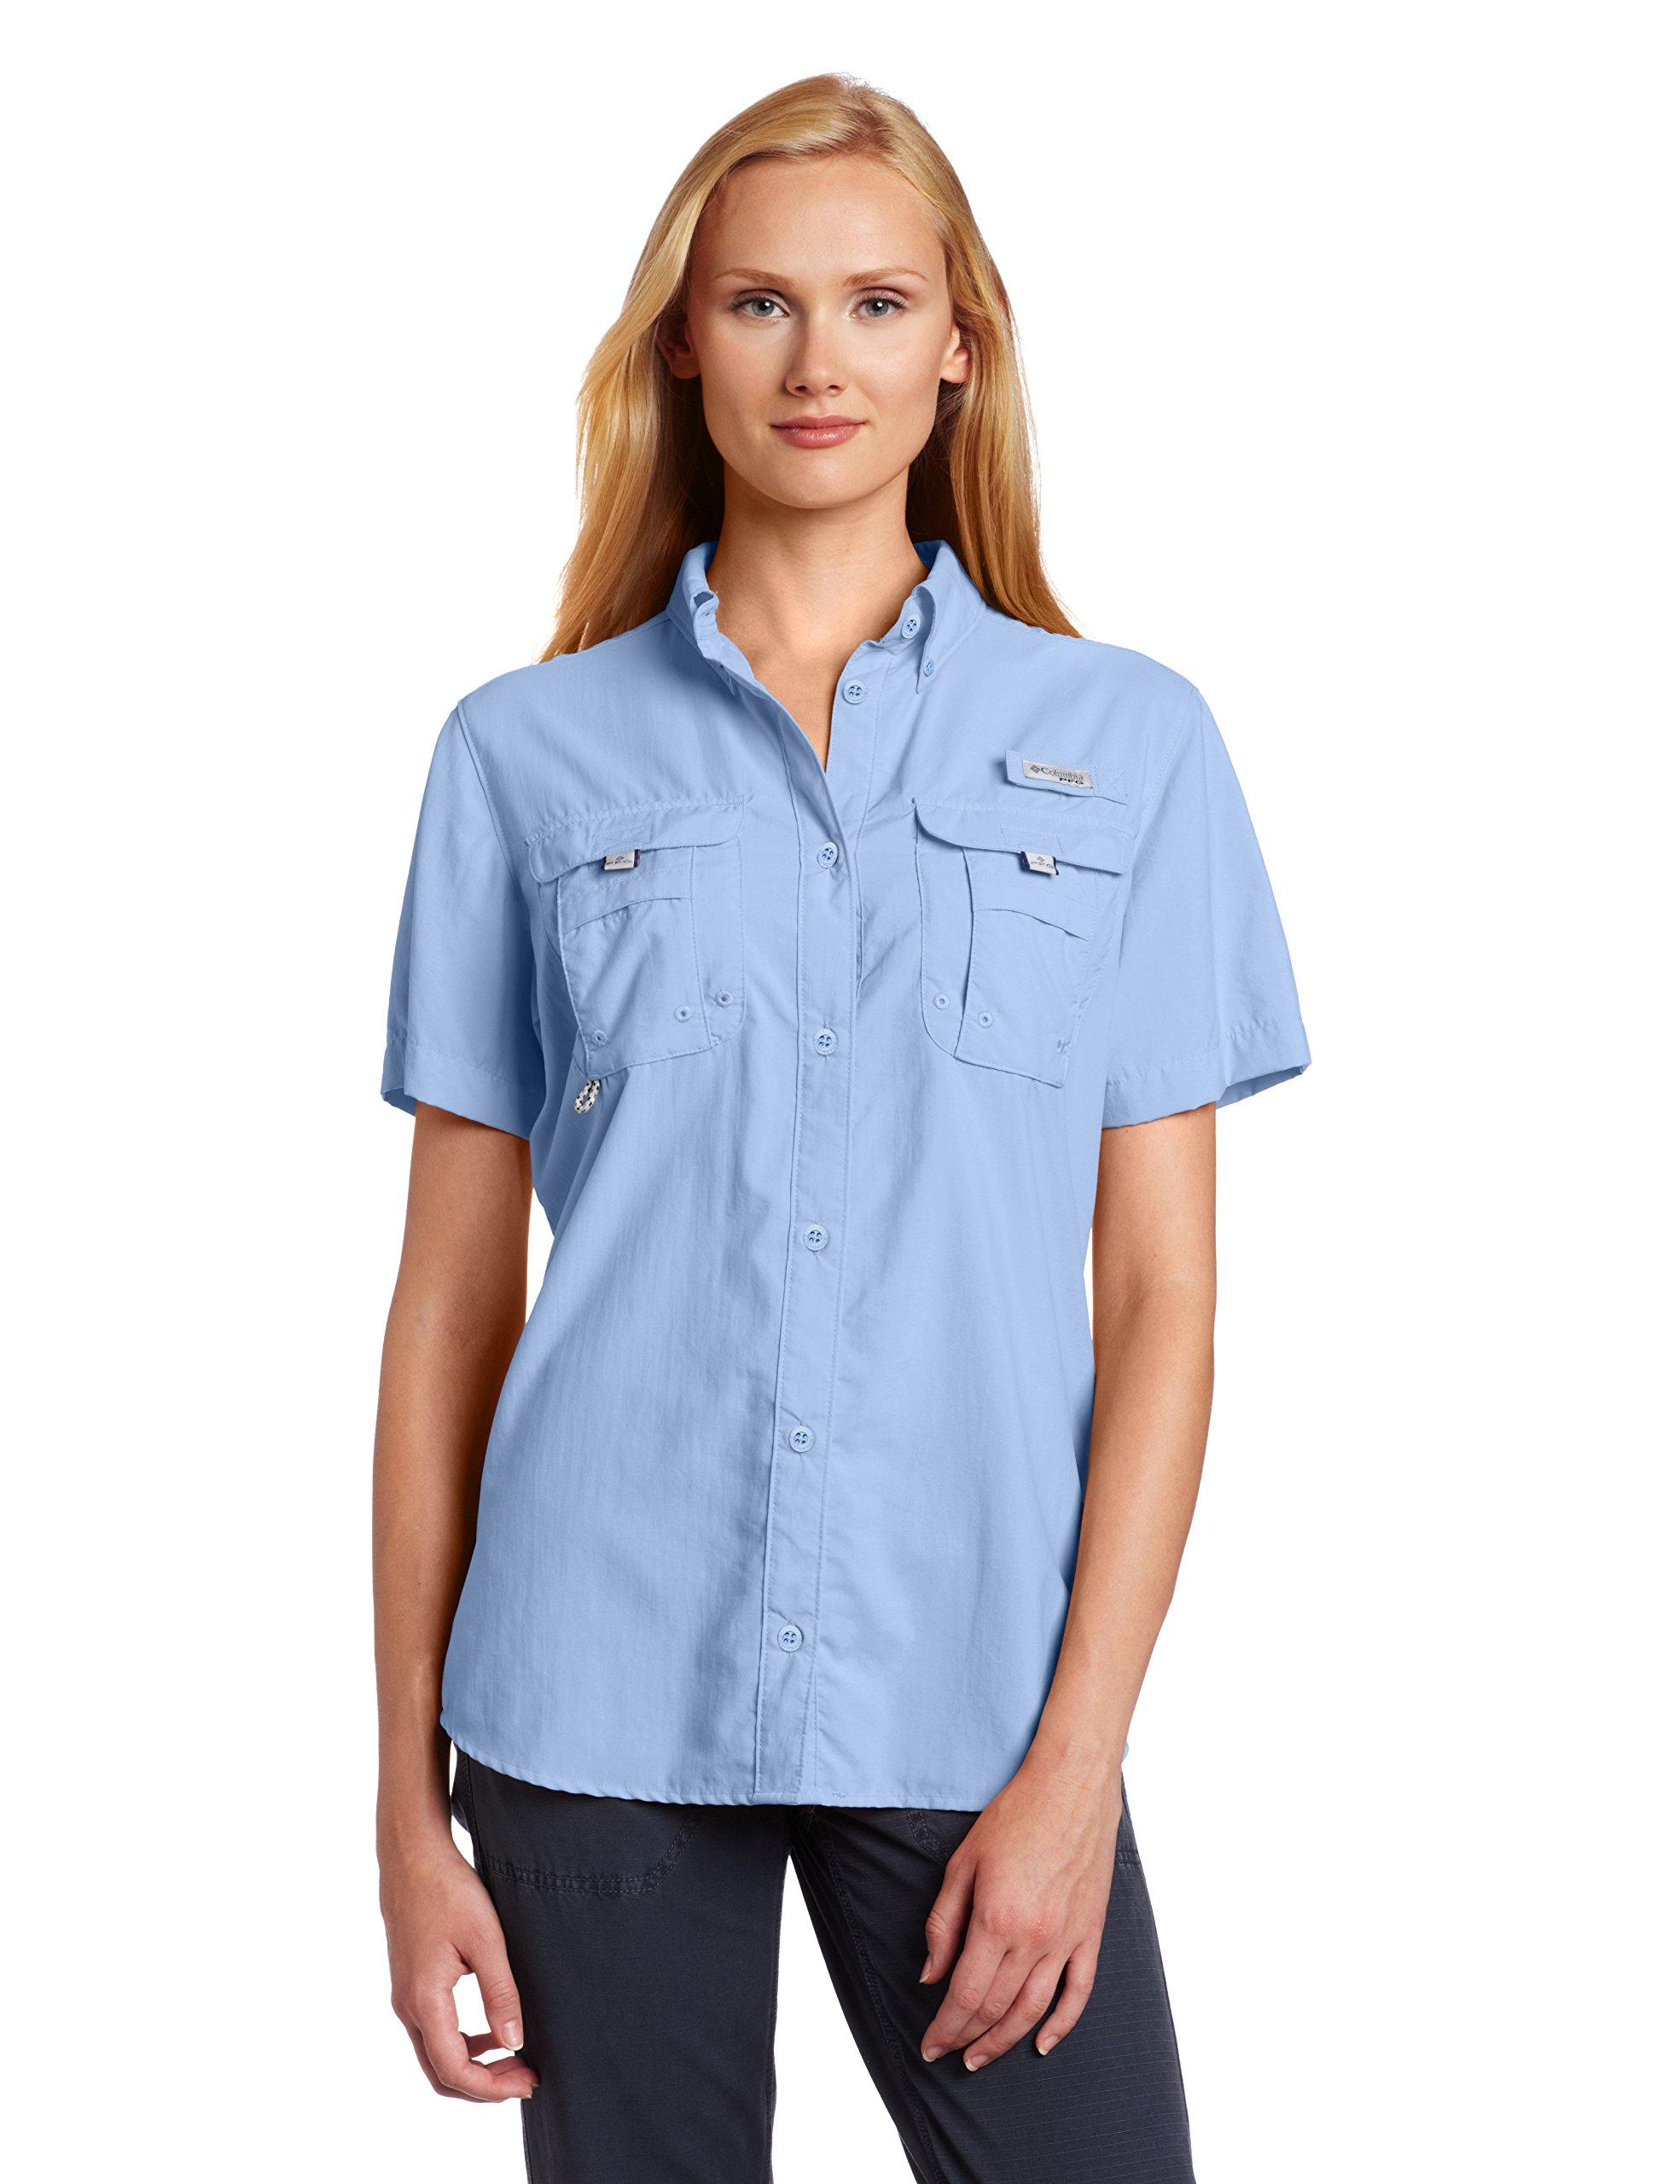 Columbia Women's PFG Bahama Short Sleeve Shirt , Empress, X-Small by Columbia